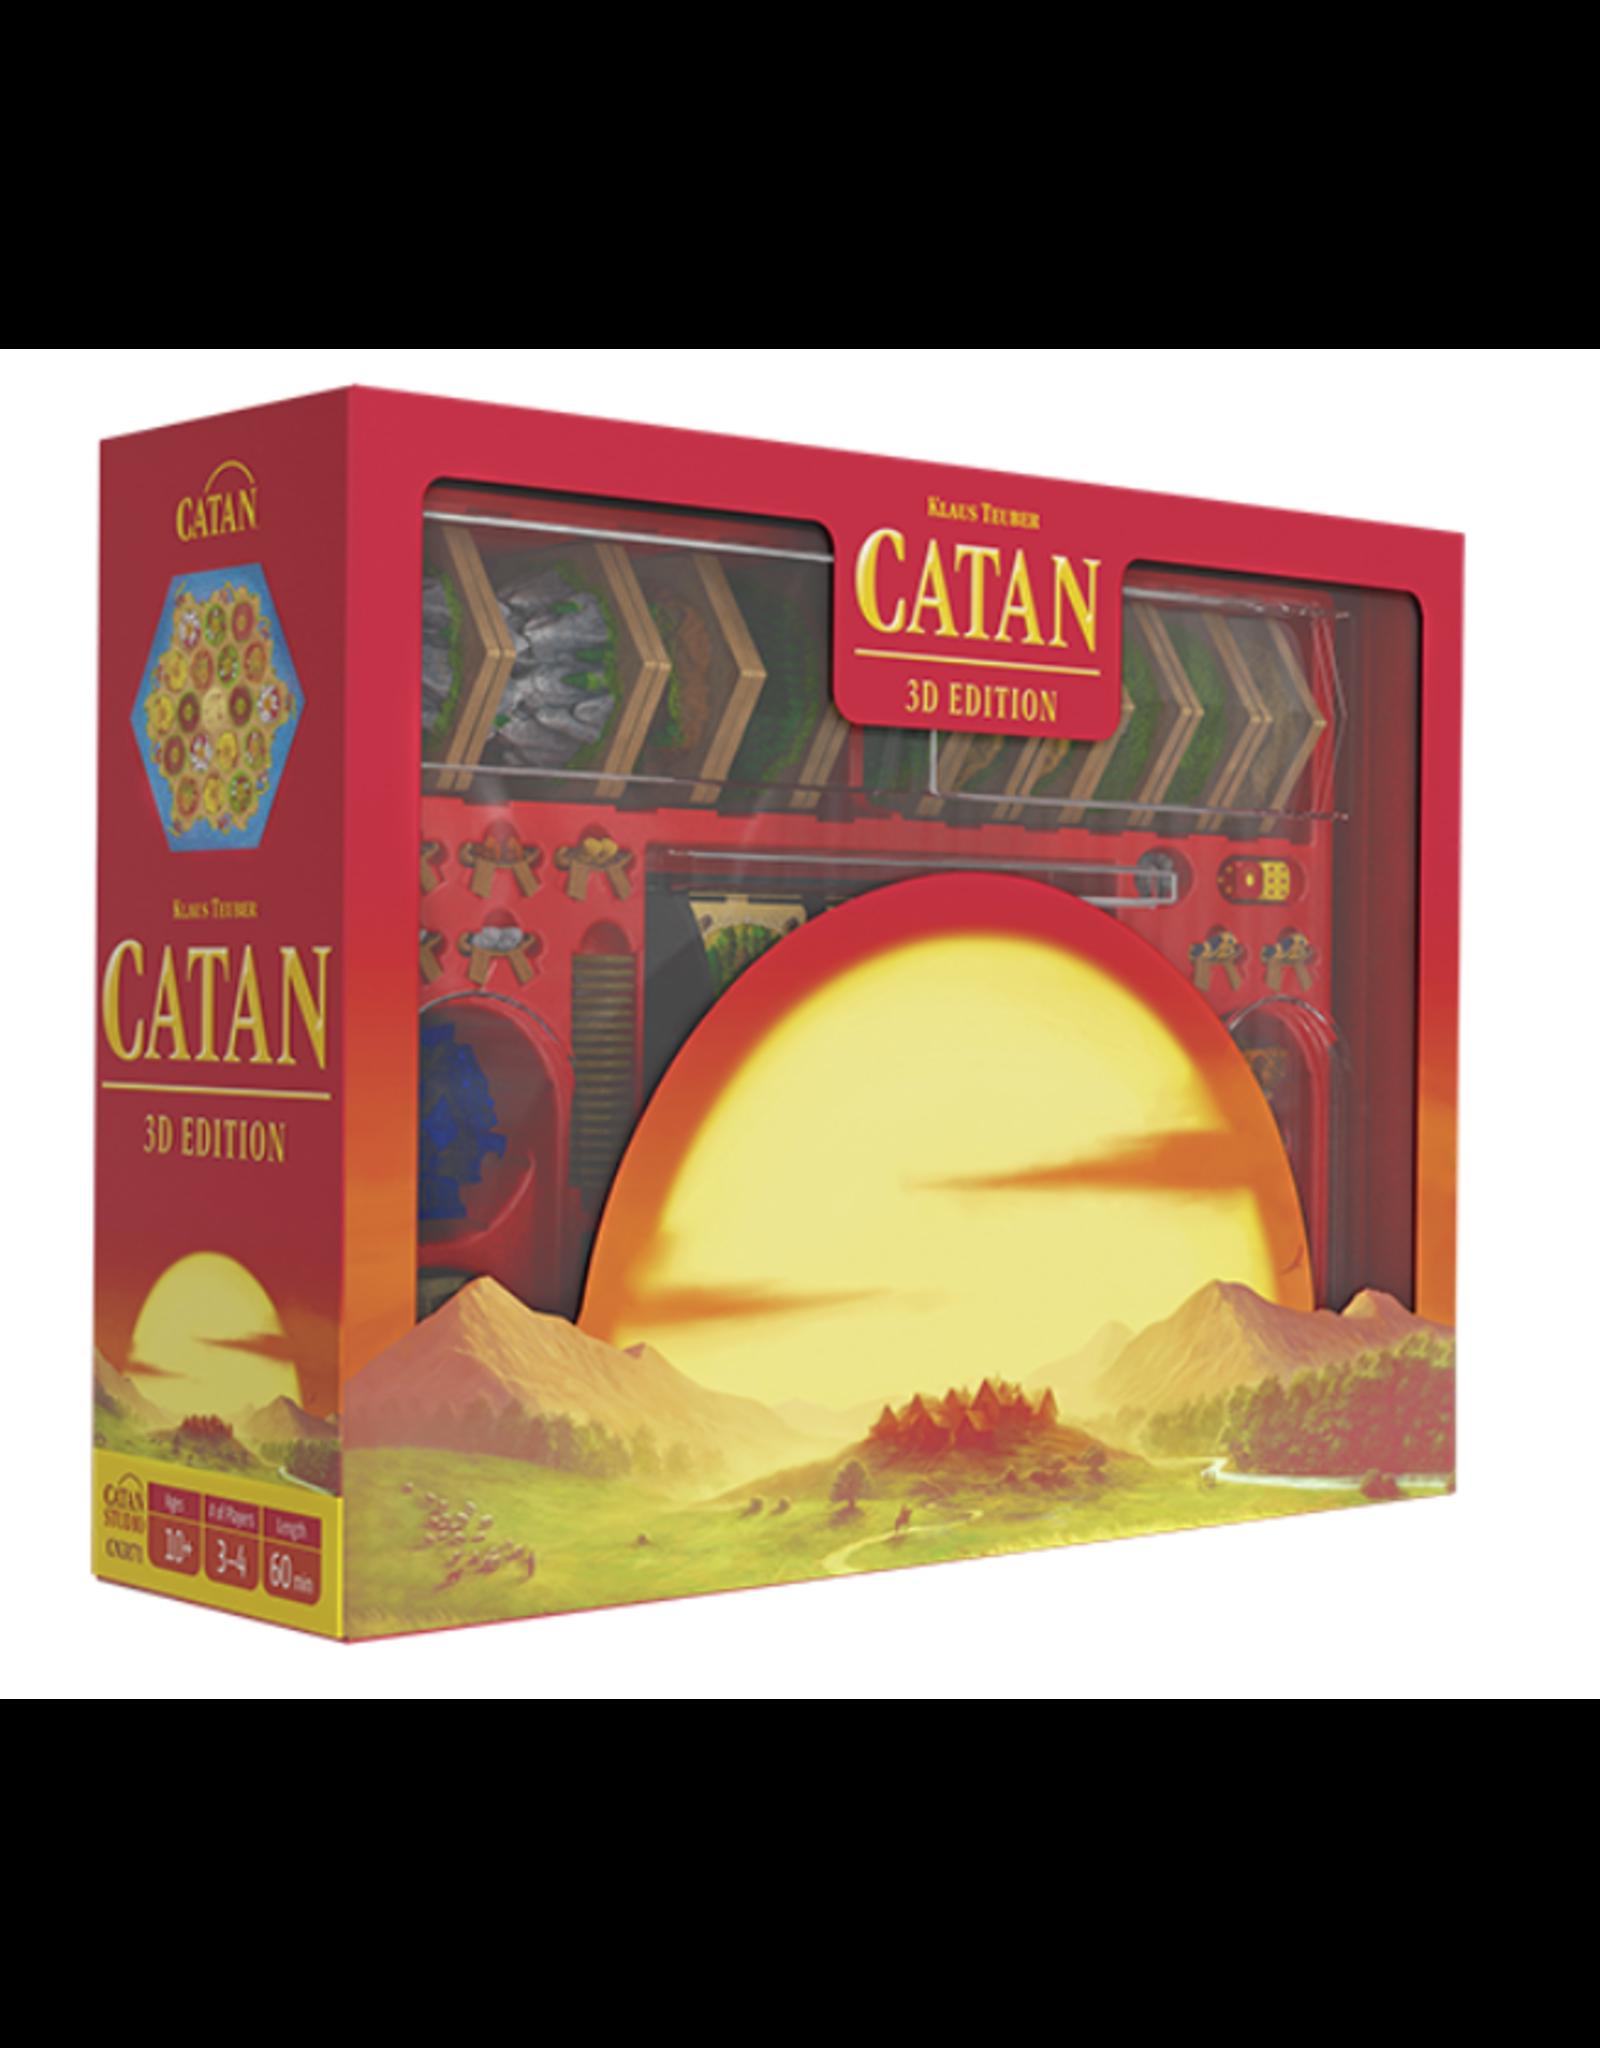 Catan Studios Catan 3D Edition (Pre Order)